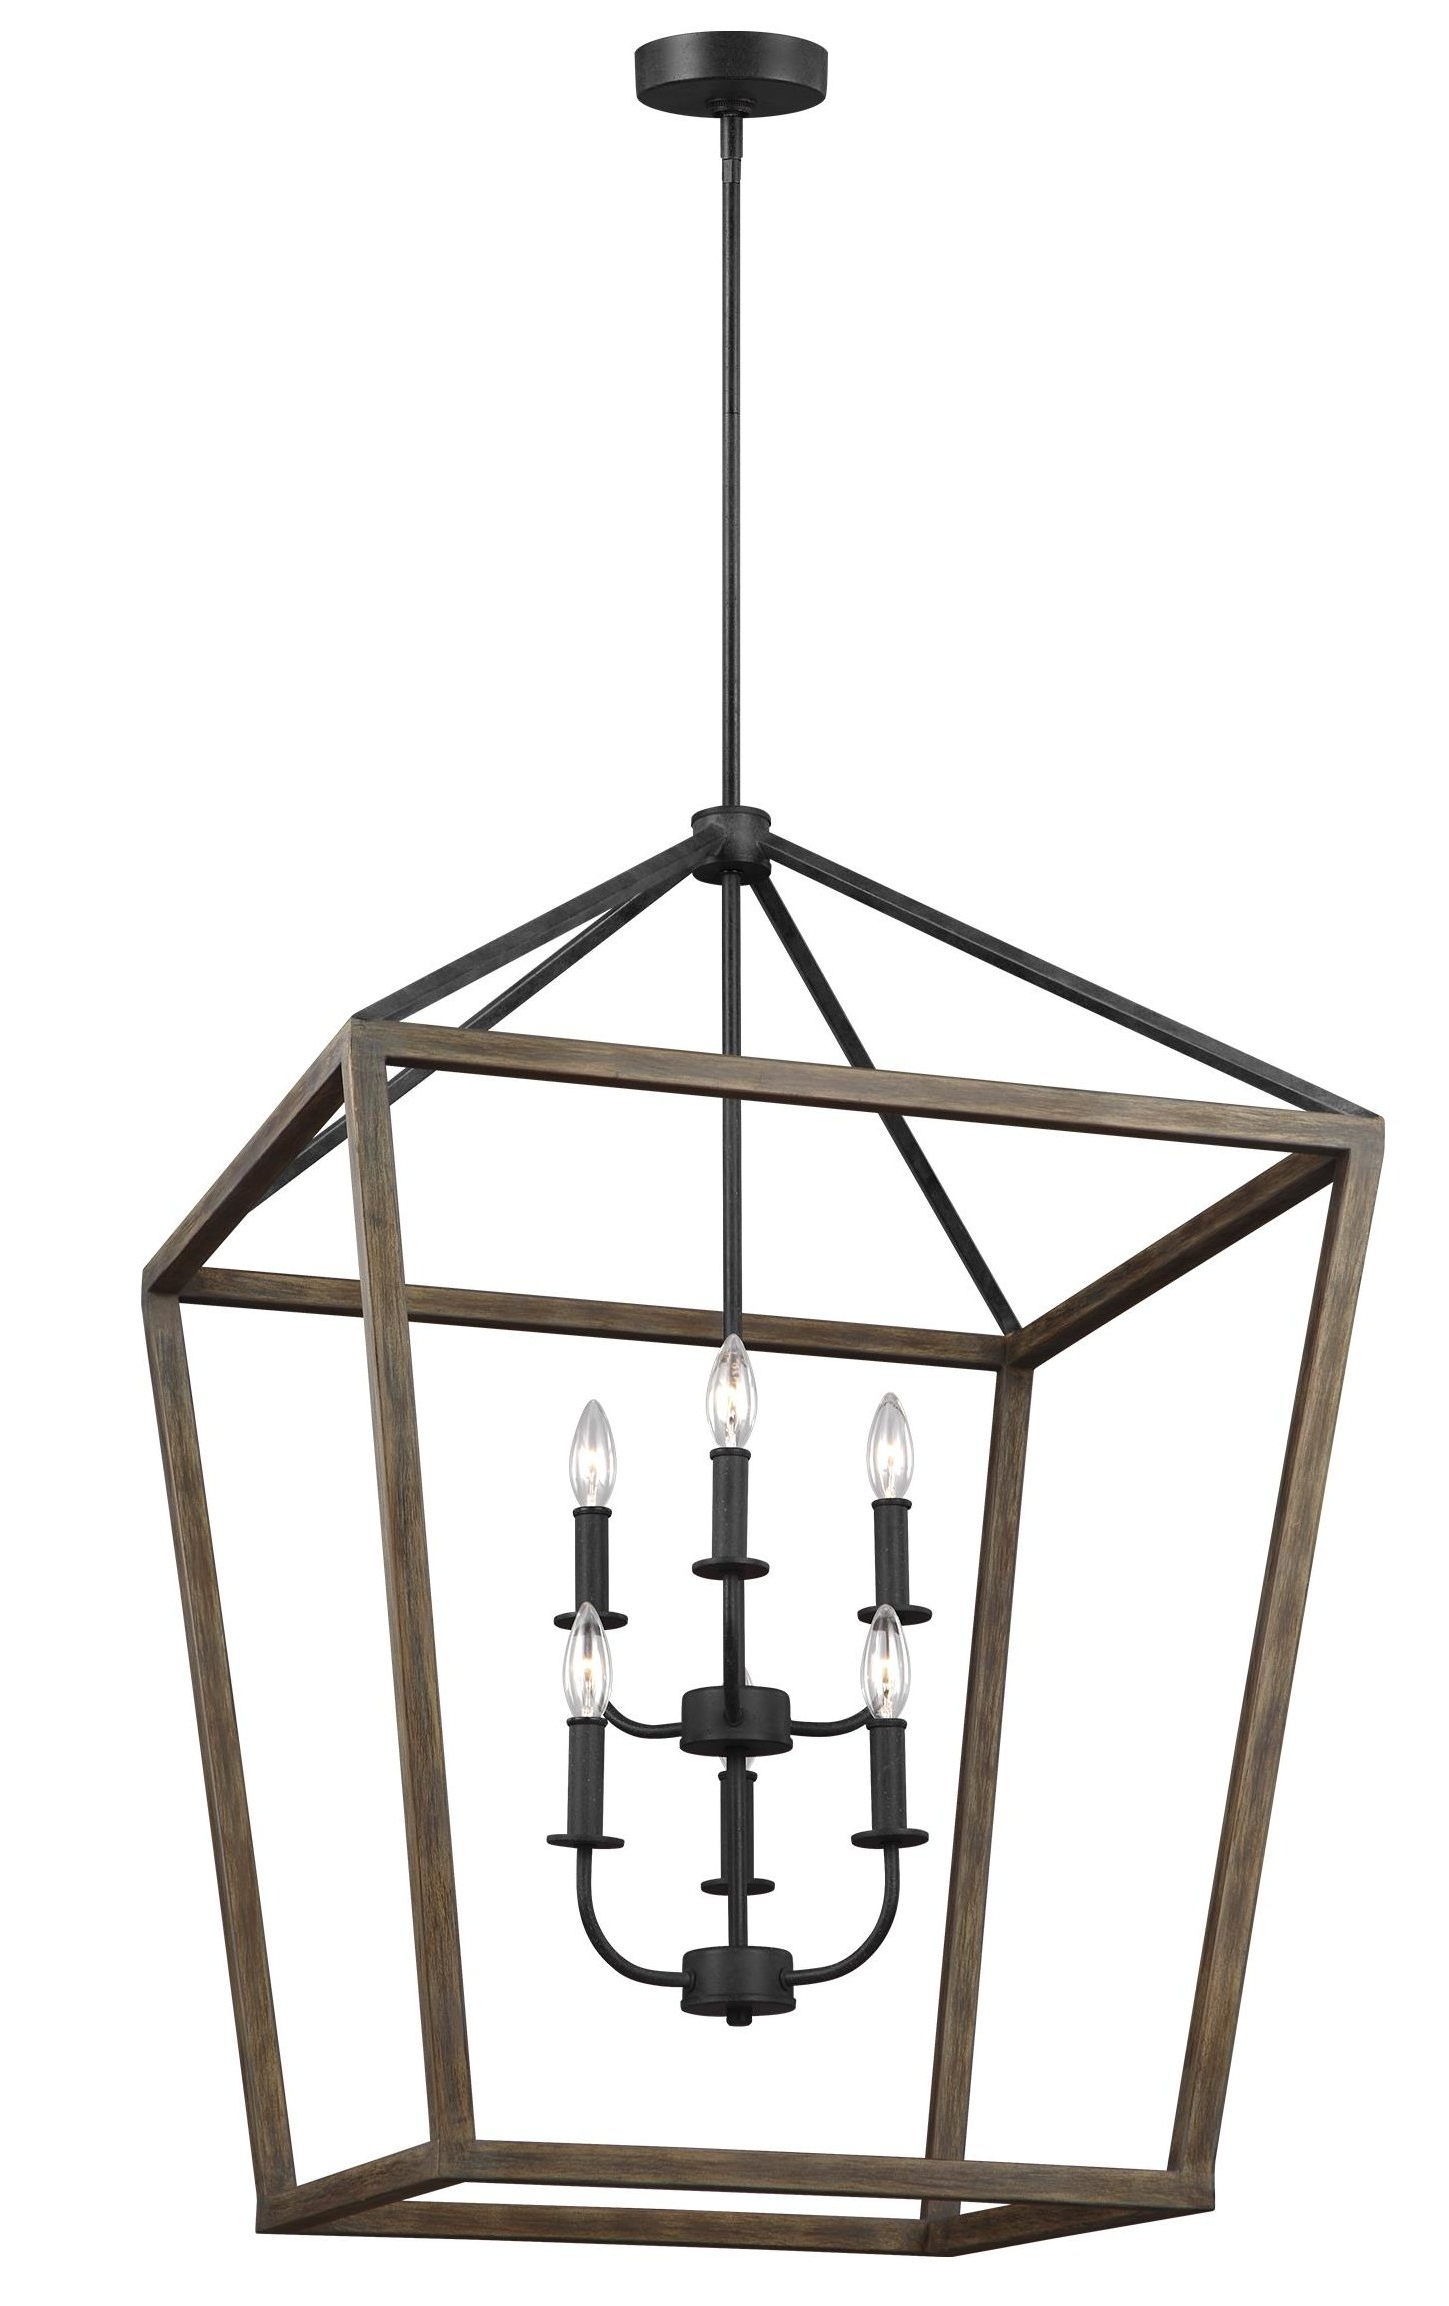 Newest Carmen 6 Light Lantern Geometric Pendants With Regard To Natarsha 6 Light Lantern Geometric Pendant (View 19 of 25)